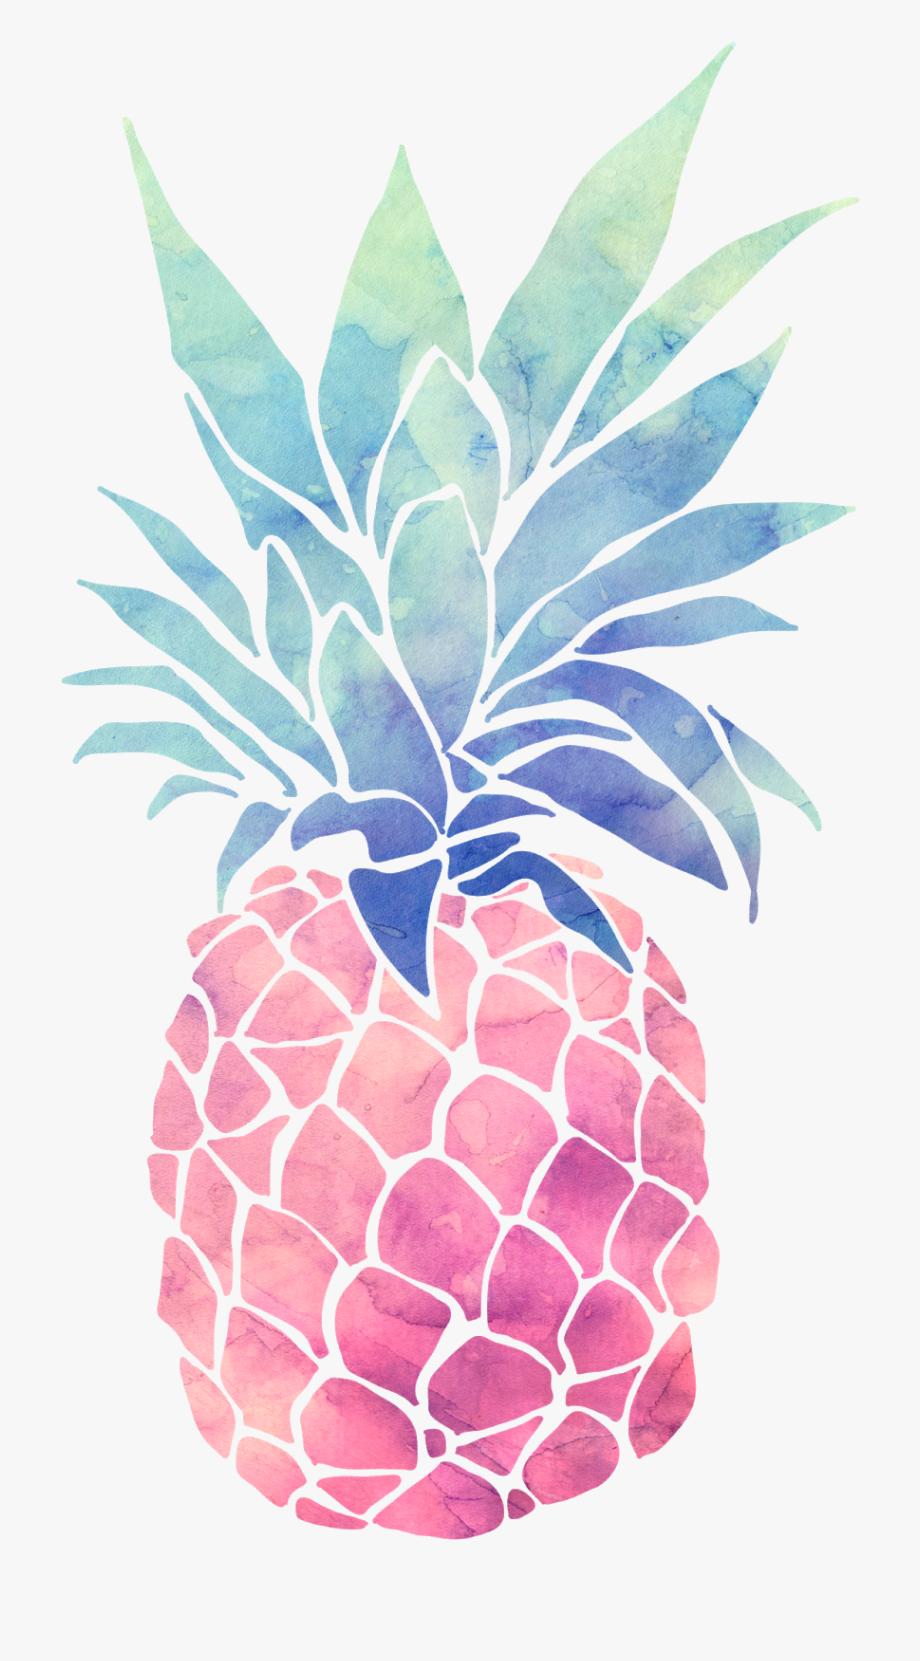 Colorful pineapple clipart jpg royalty free Pineapple Color - Pineapple Themed Birthday Invitations #905523 ... jpg royalty free